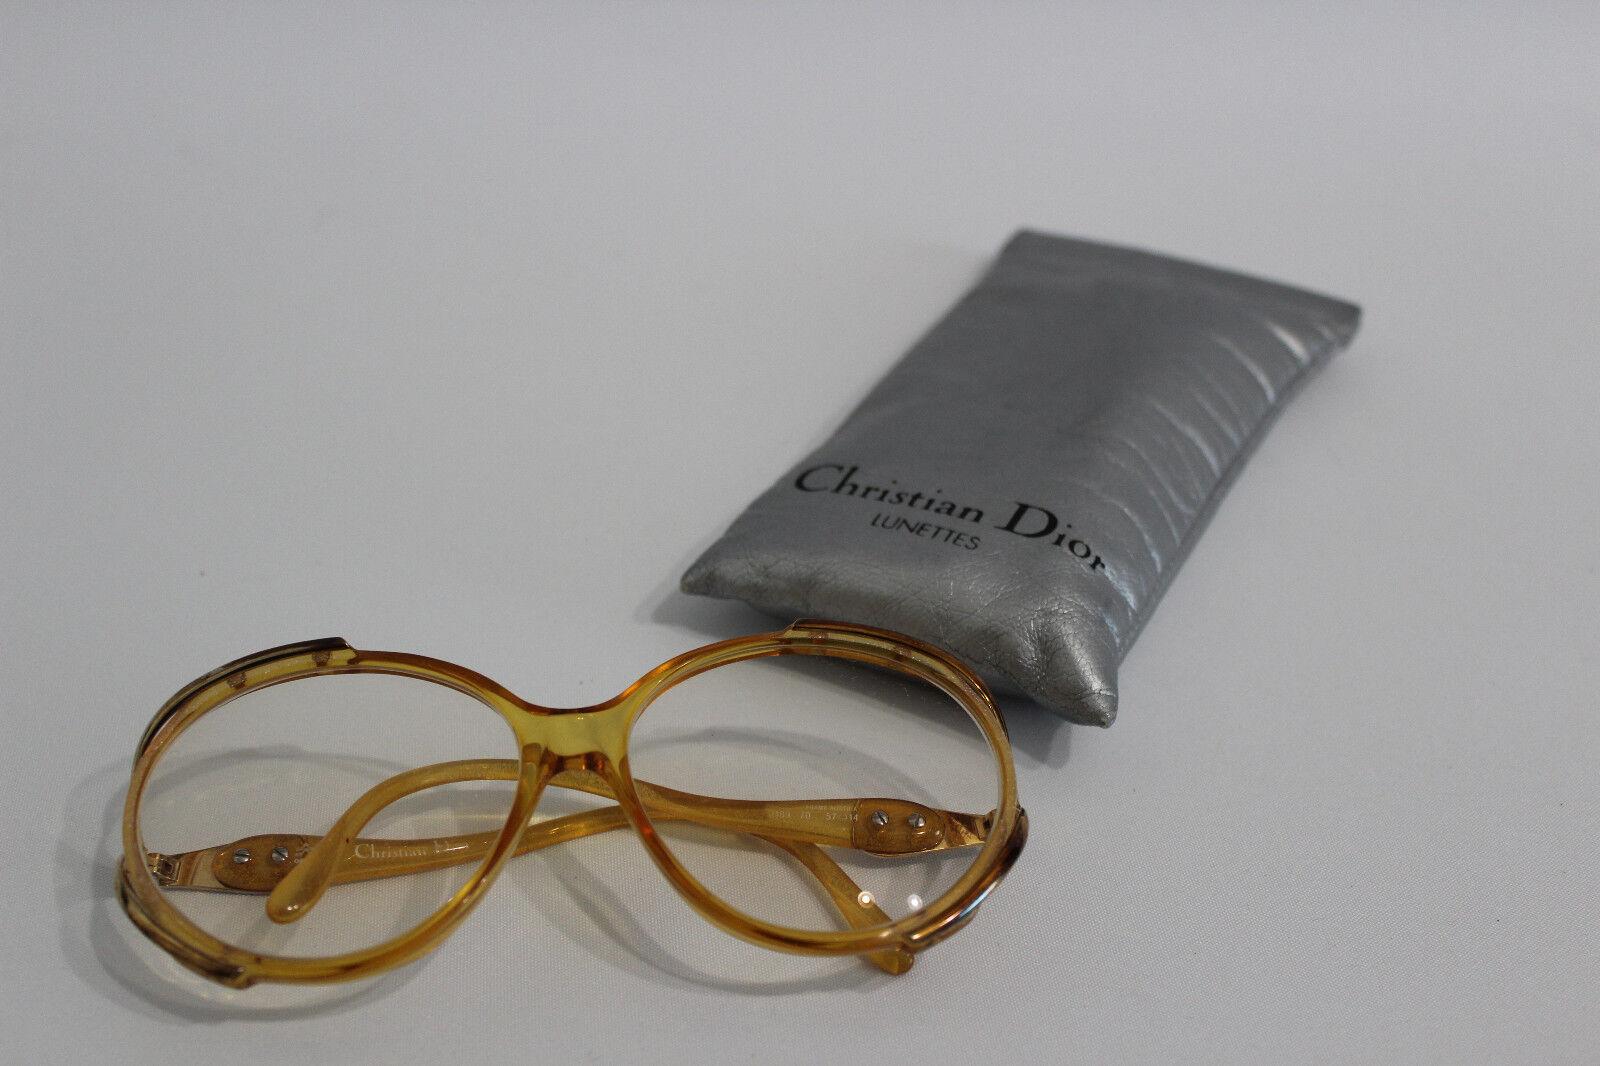 60er 70er years Glasses Christian Dior Vintage Frame Plus Pouch Ethnic Boho-show original title